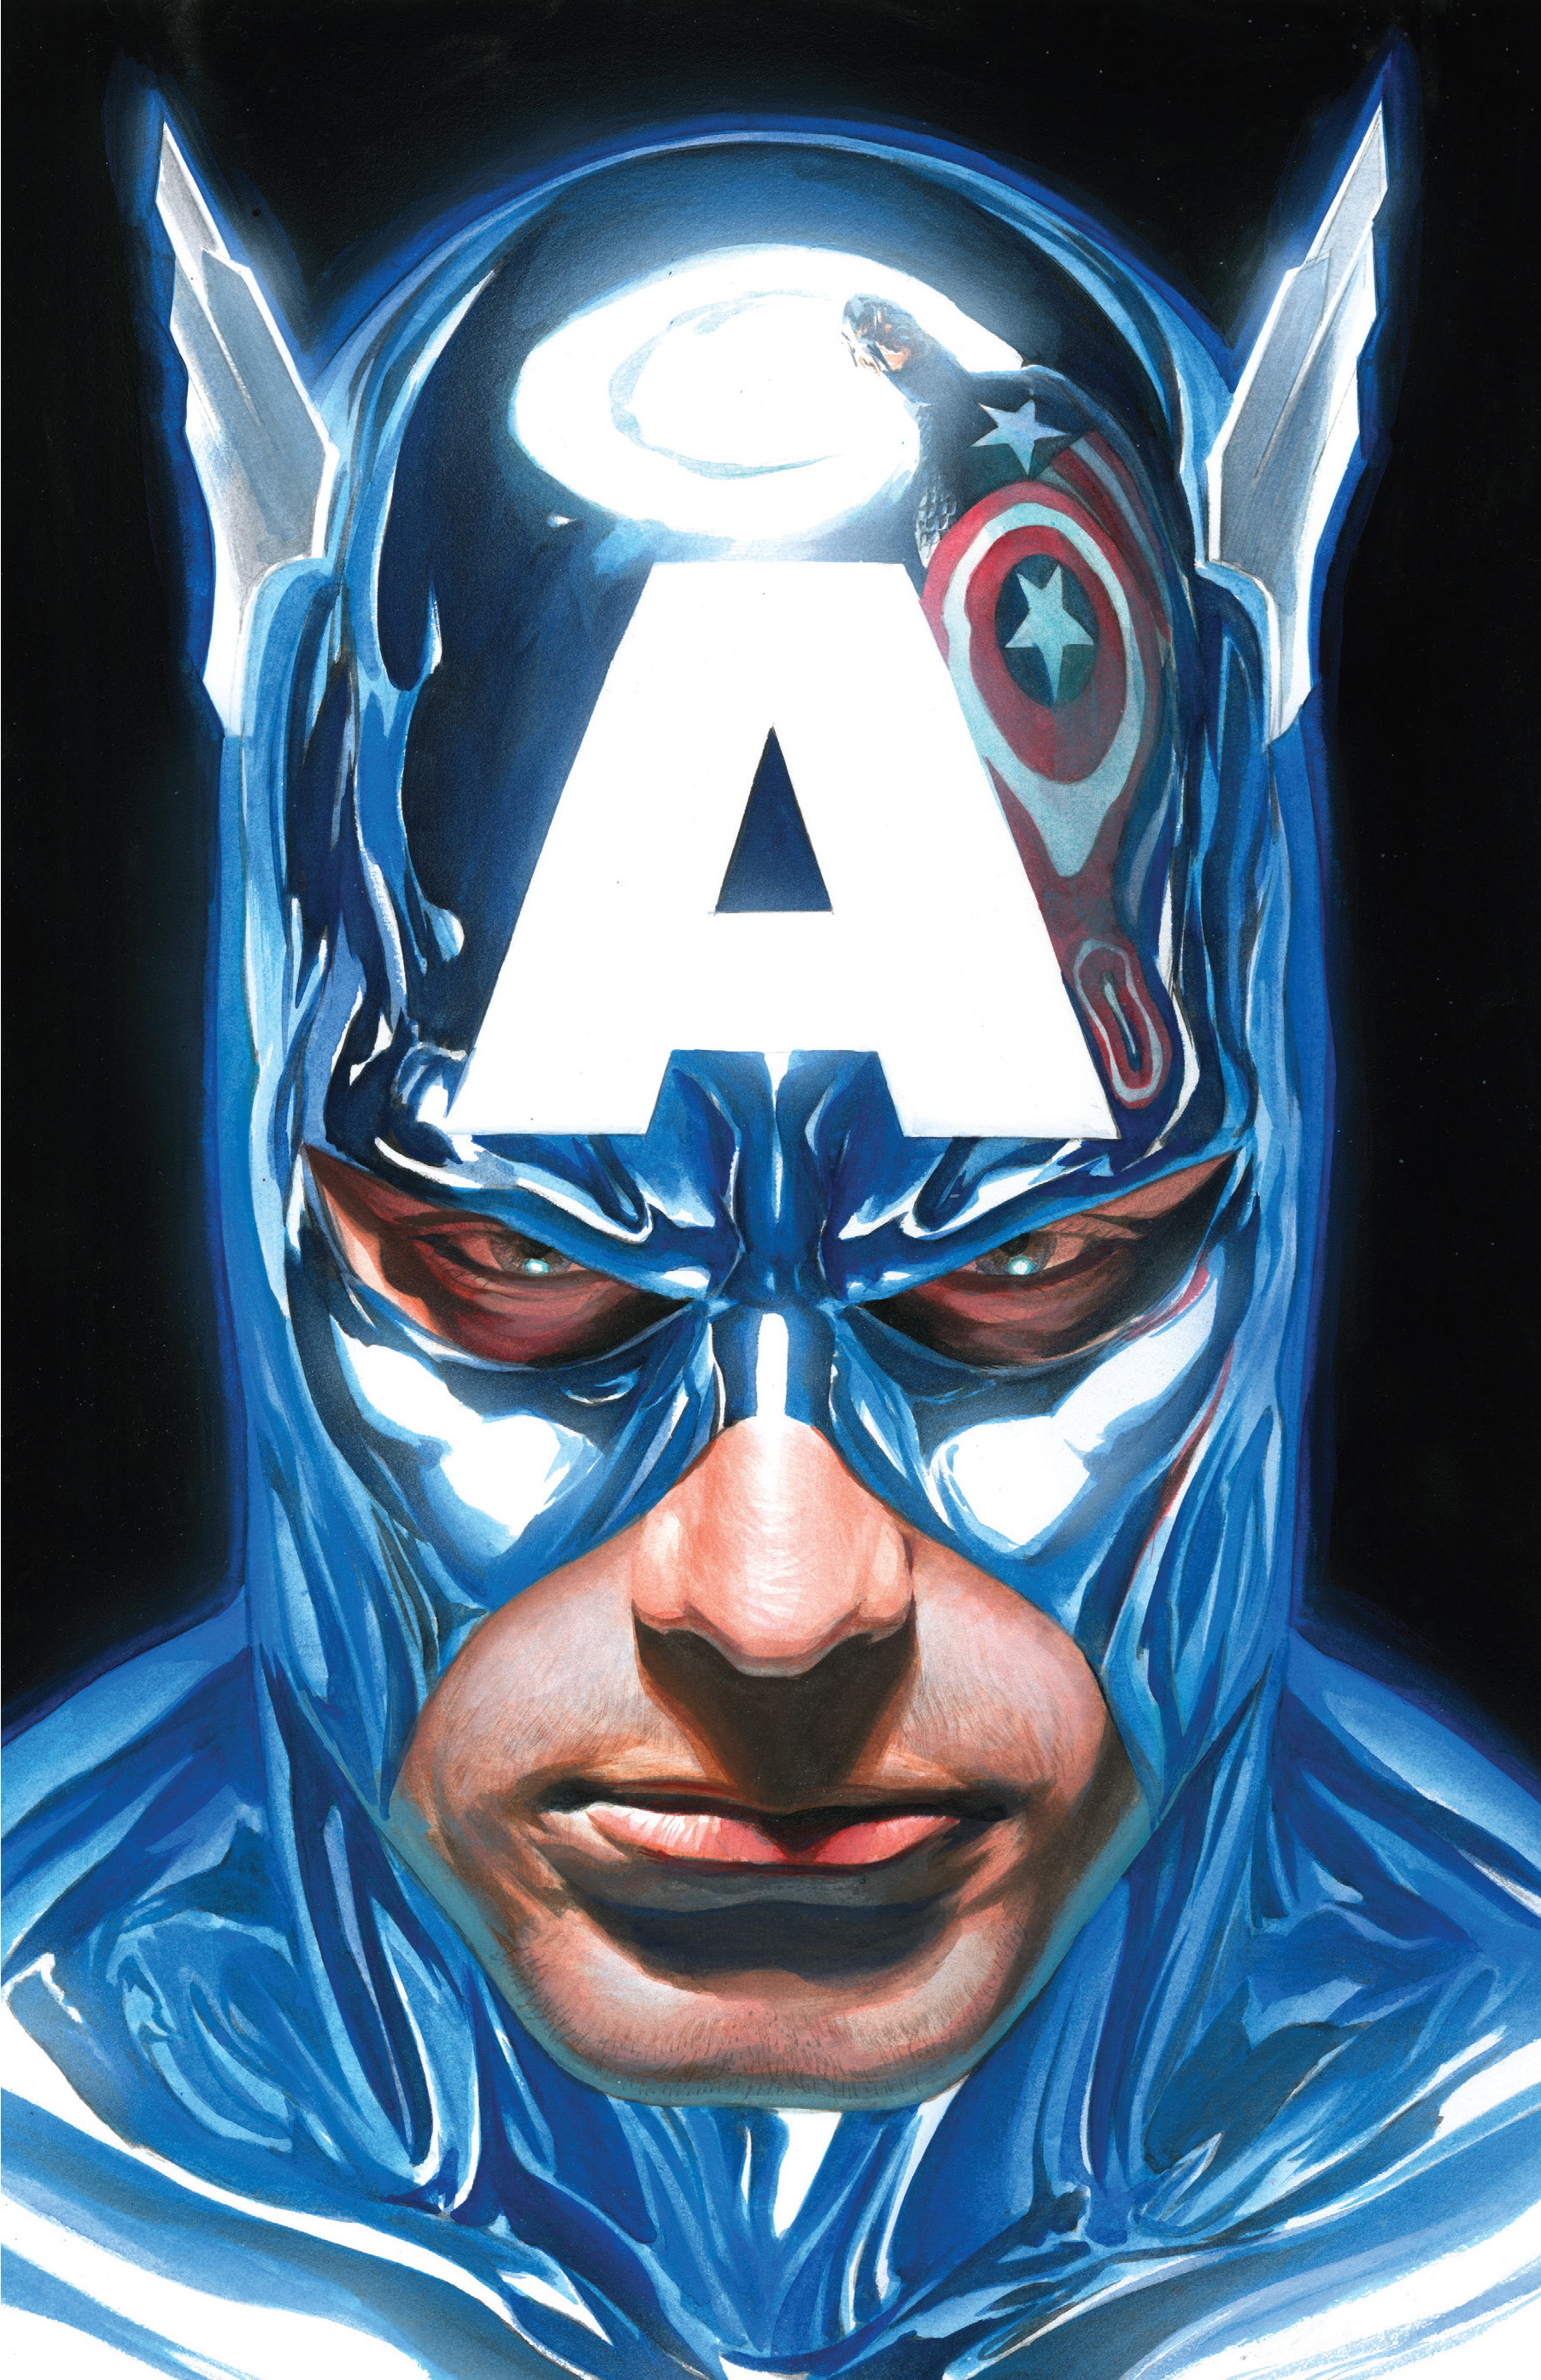 Captain America Vol 5 34 Dynamic Forces Variant Textless.jpg